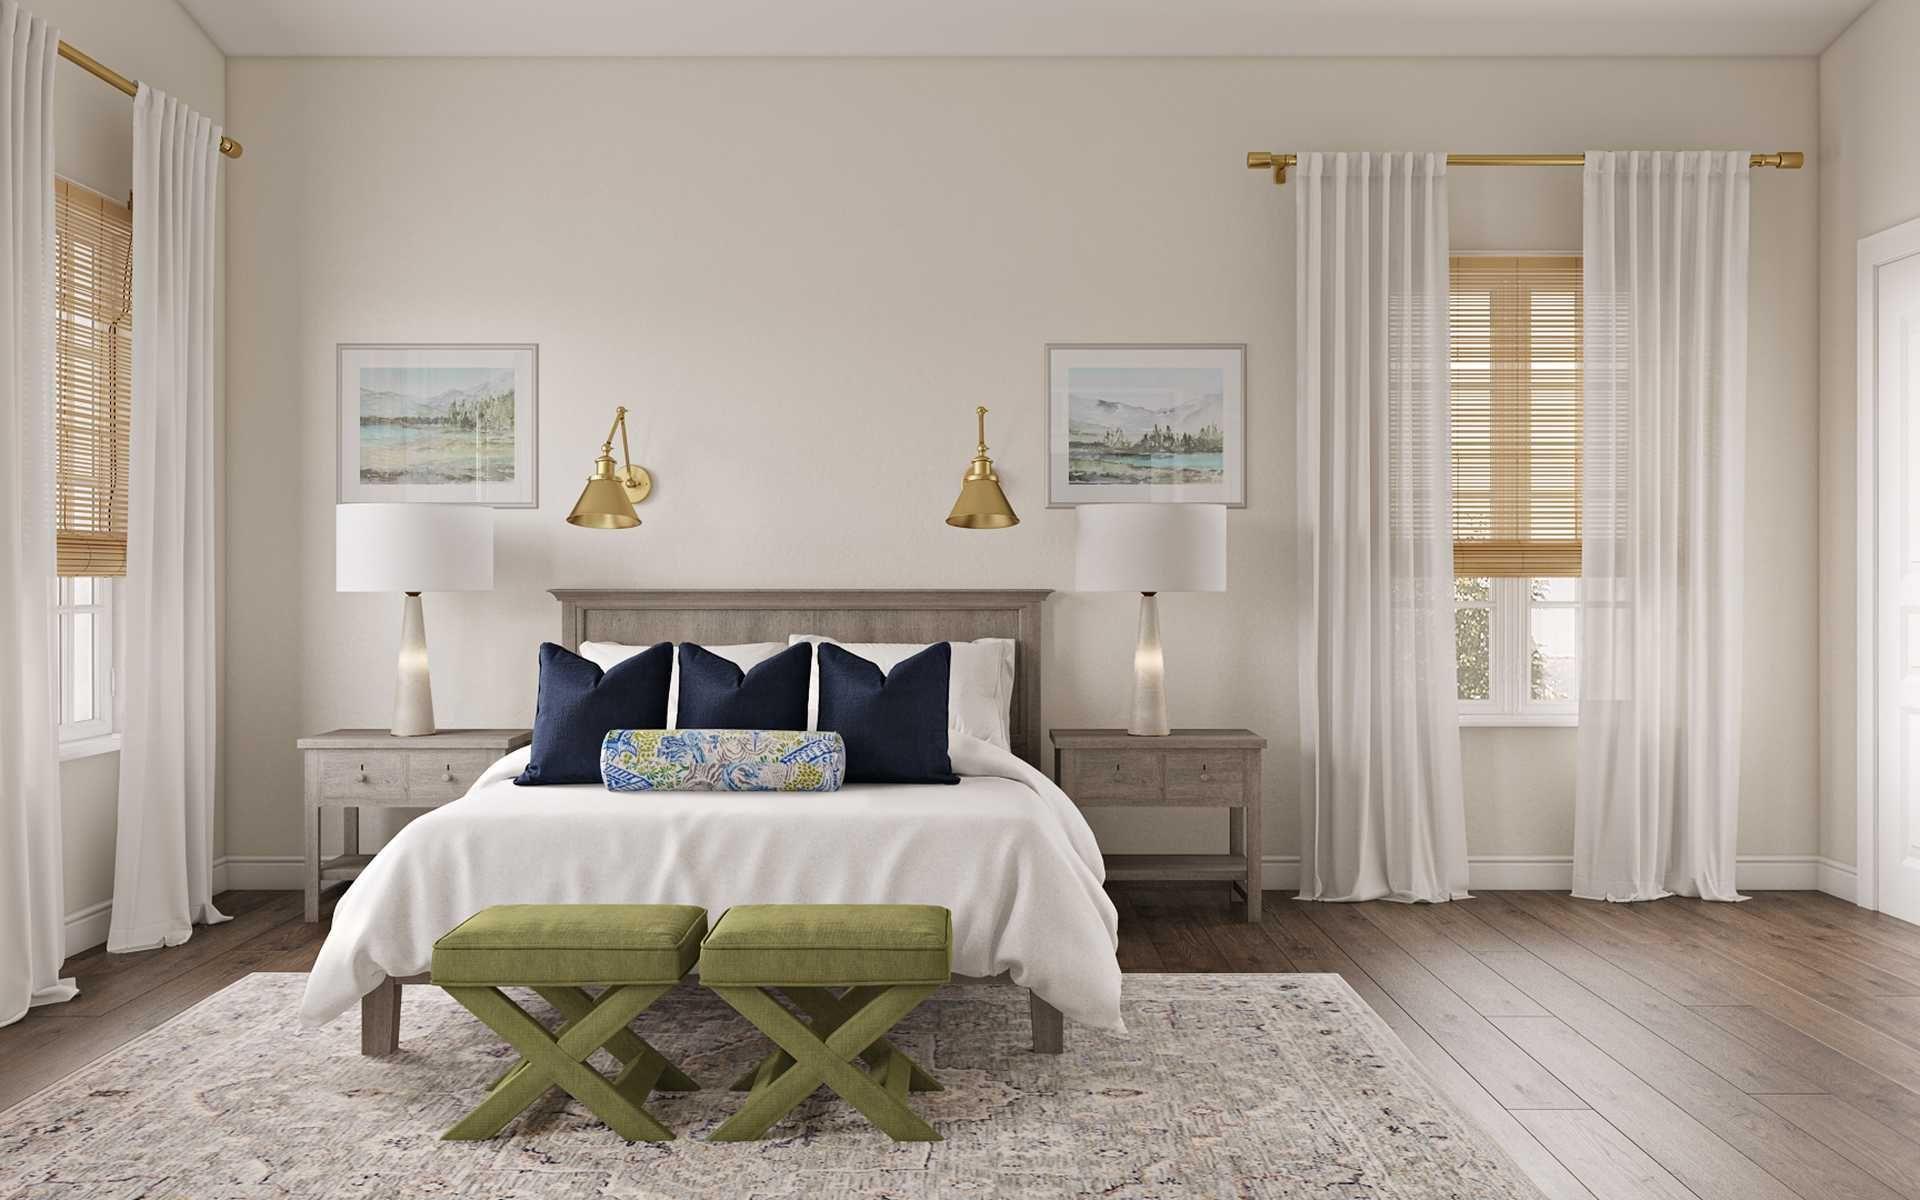 Classic Bedroom Design By Havenly Interior Designer Tracie Bedroom Design Classic Bedroom Design Online Interior Design